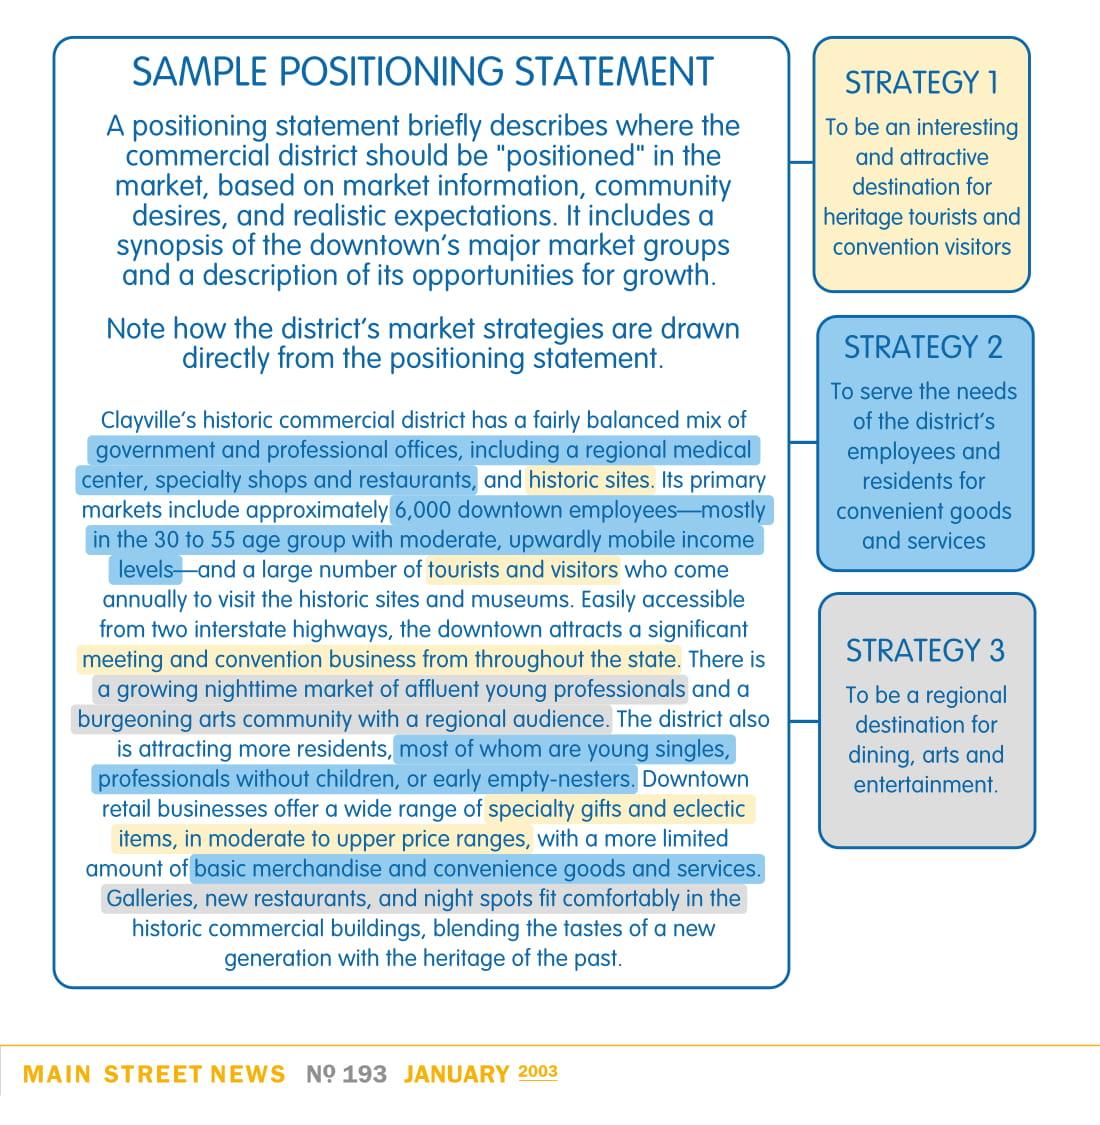 positioningstatementsample 1